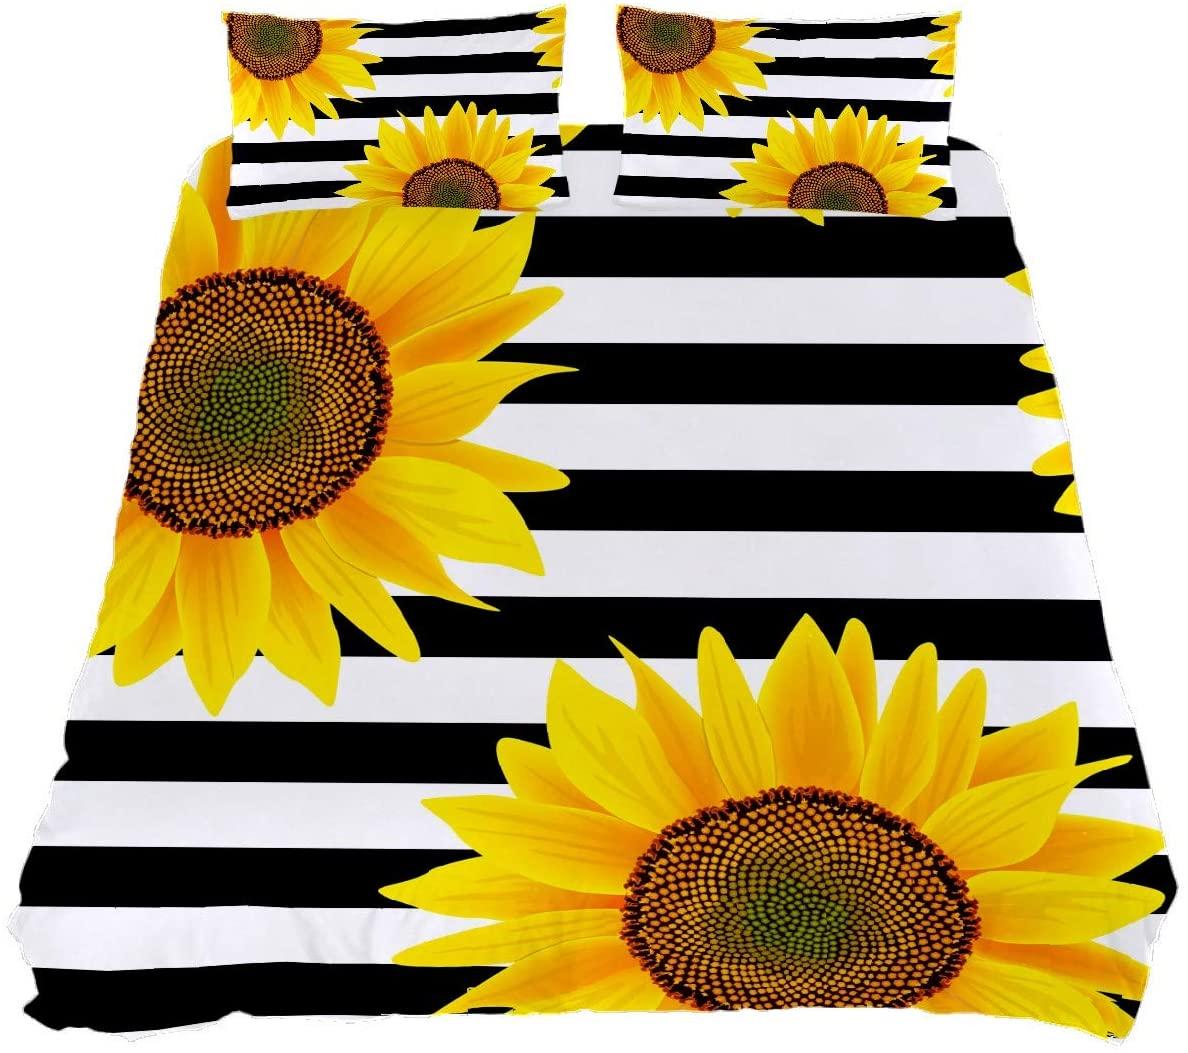 N\O Sunflower Comforter Set 3 Piece Queen Bedding Set Black White Striped Fade Resistant Duvet Cover Set Soft Lightweight Home Decor for Bedroom Girls Boys Kids Room with 2 Pillowcases